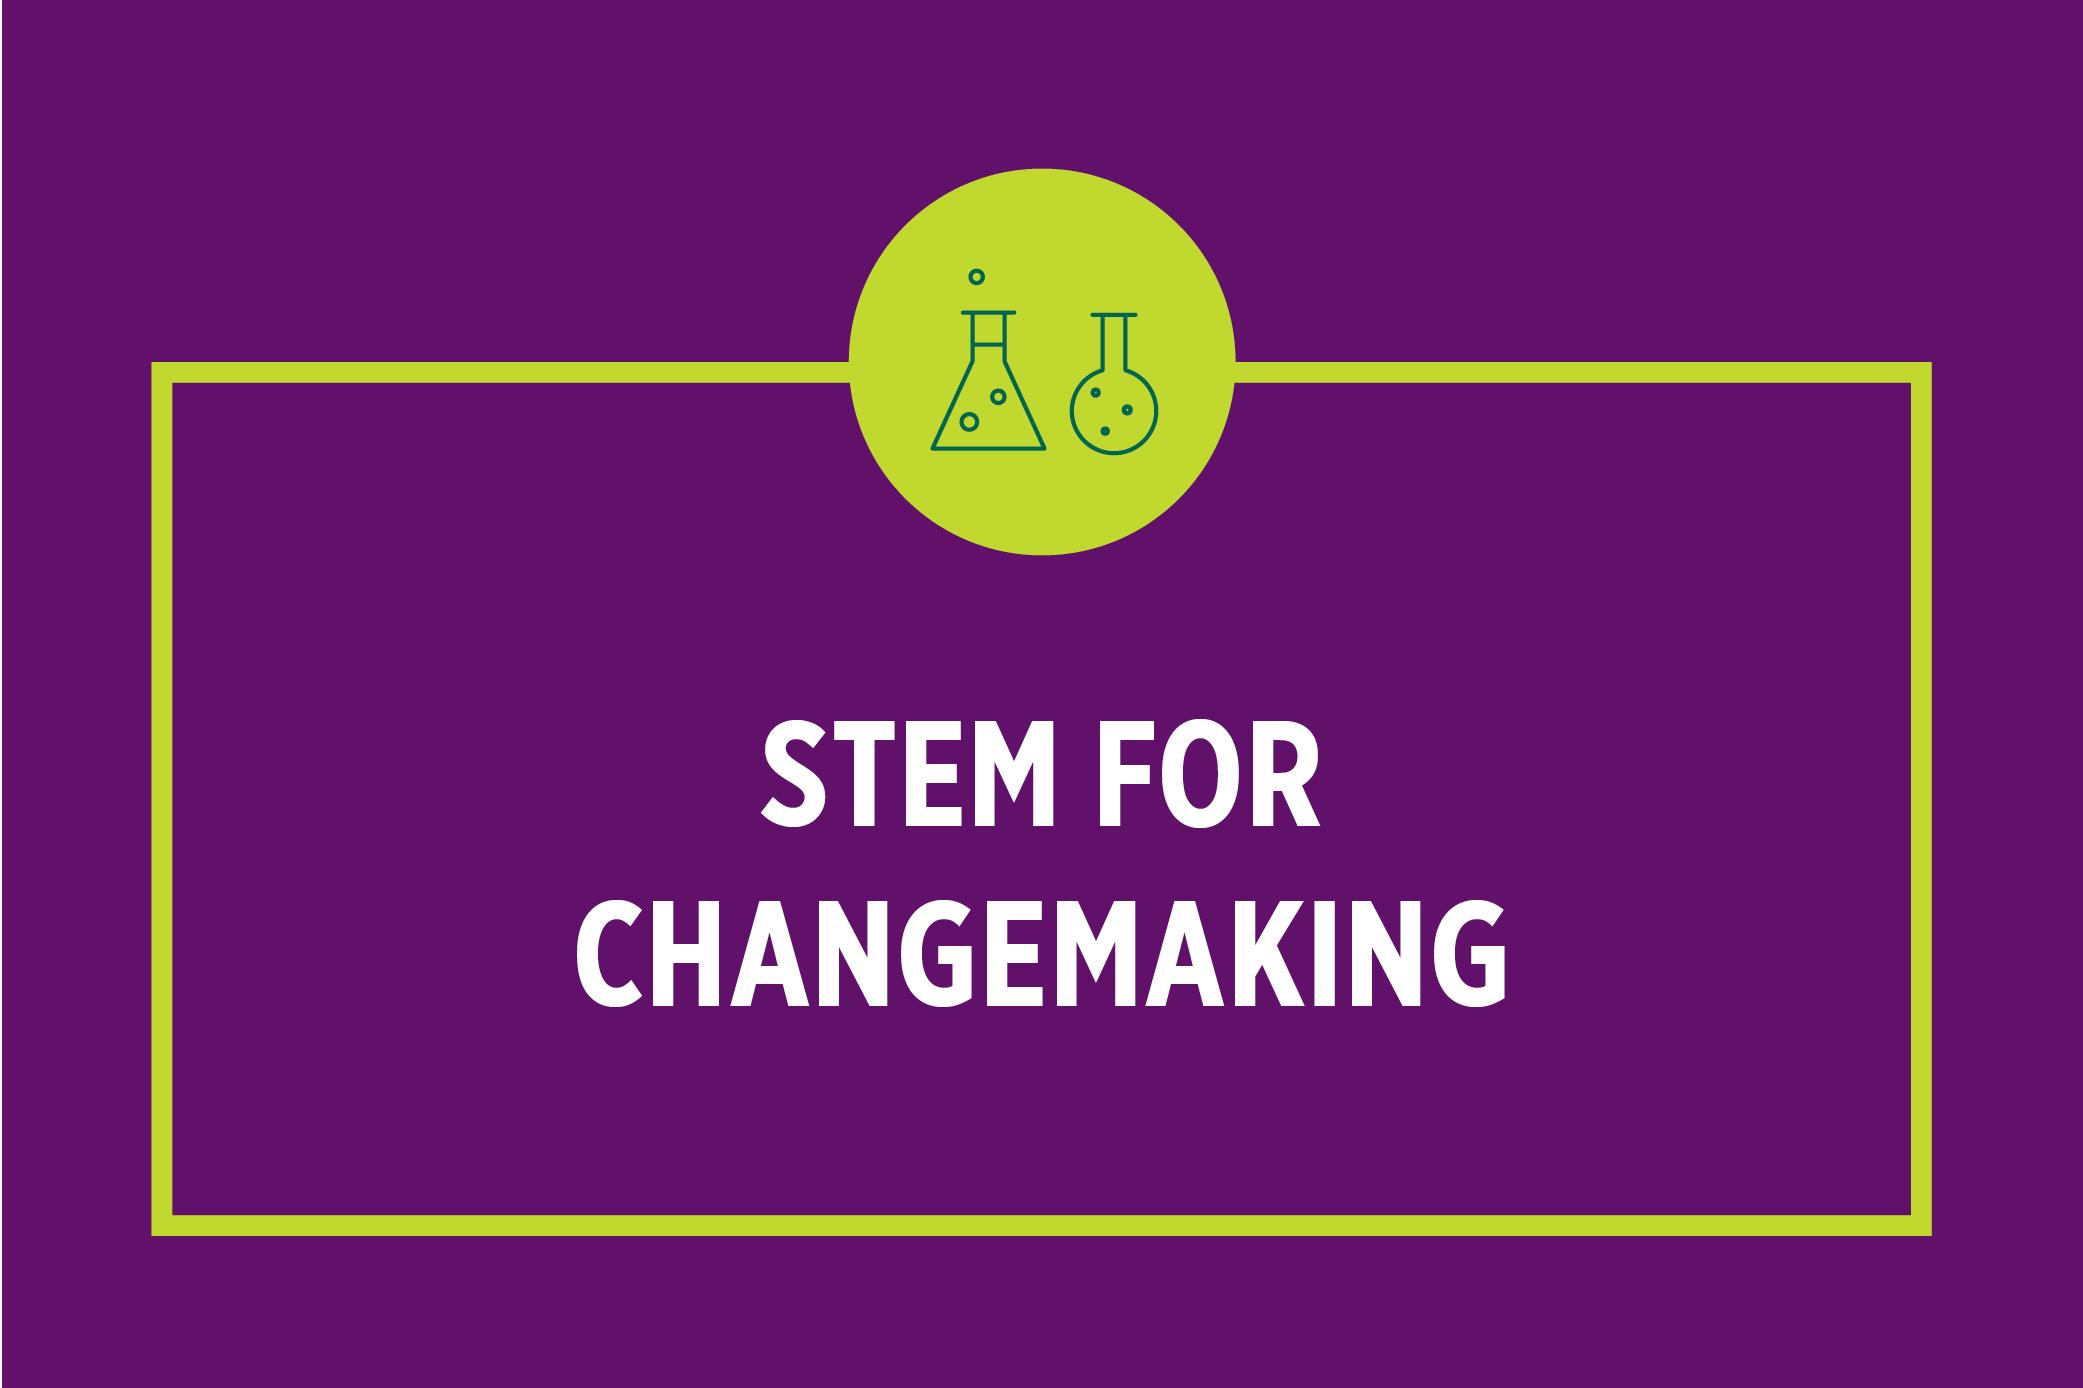 STEM for Changemaking: Inspiring the Next Generation